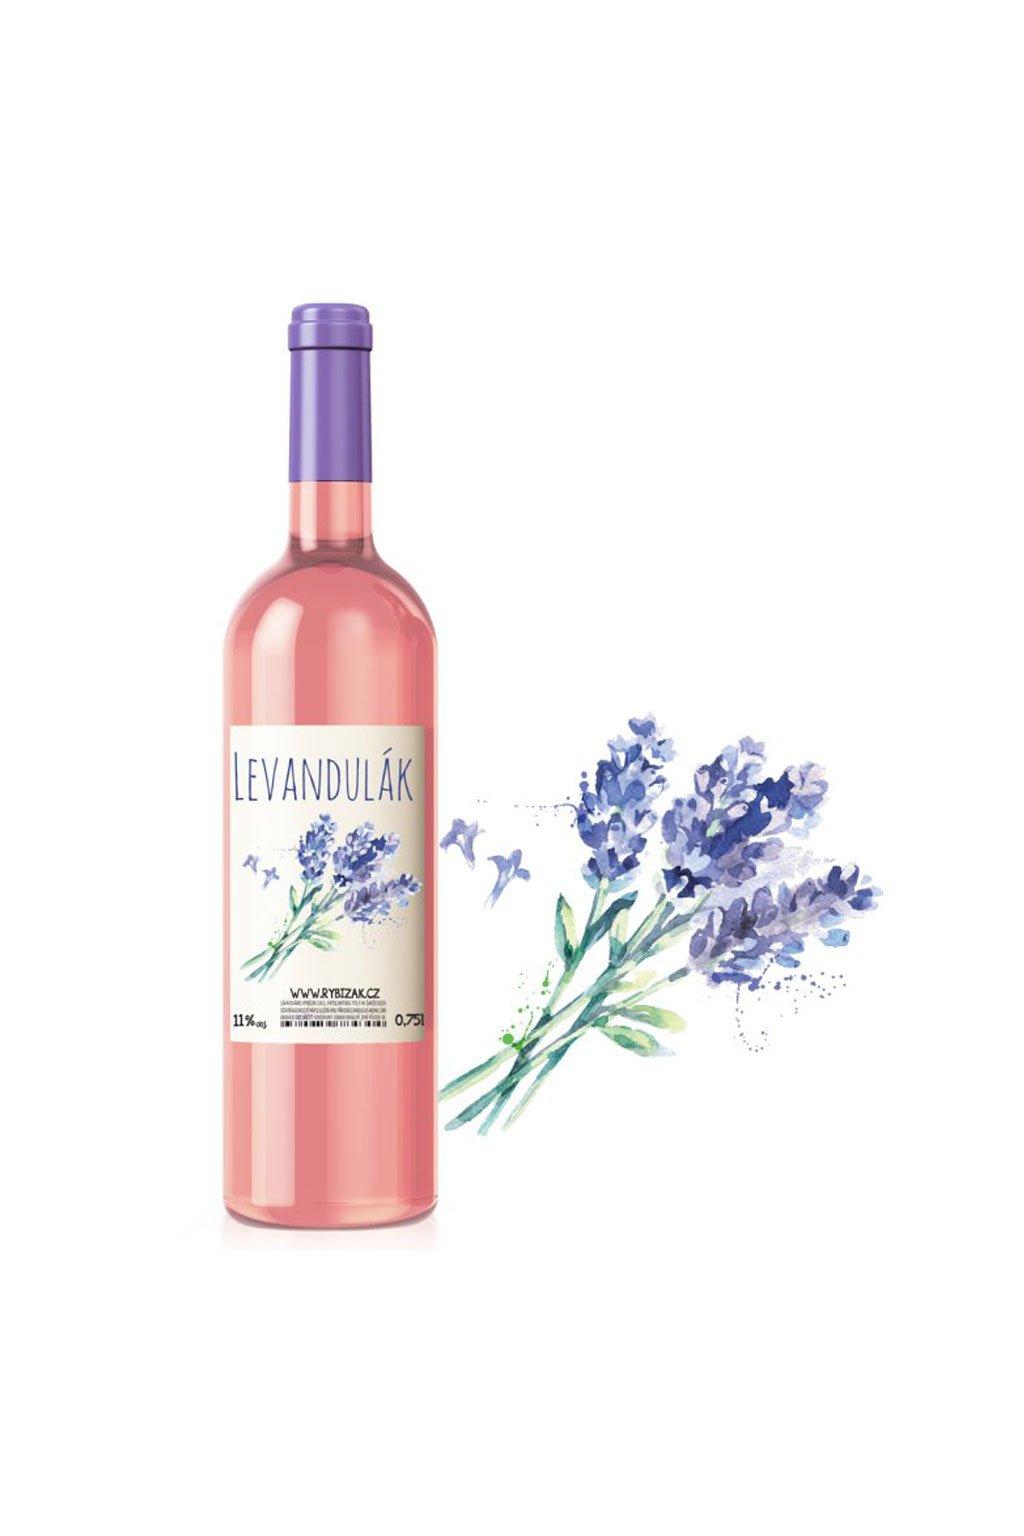 Levandulák ovocné víno z levandule Gurmetéka